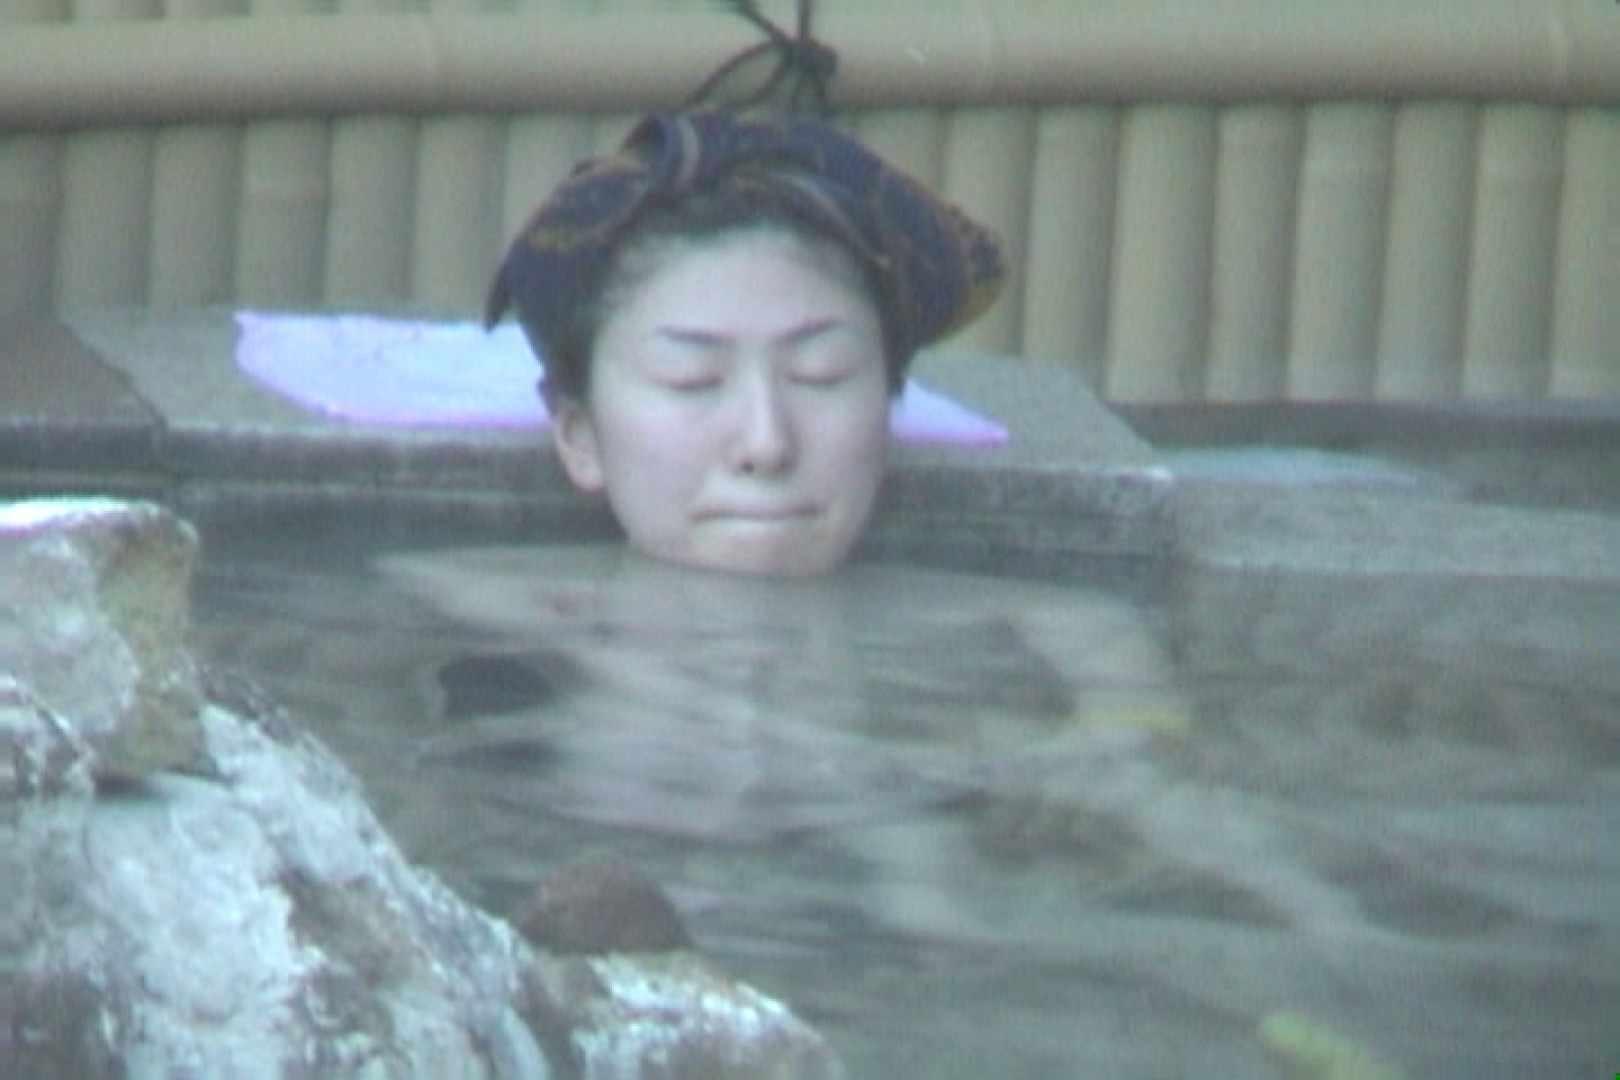 Aquaな露天風呂Vol.607 綺麗なOLたち アダルト動画キャプチャ 90枚 74